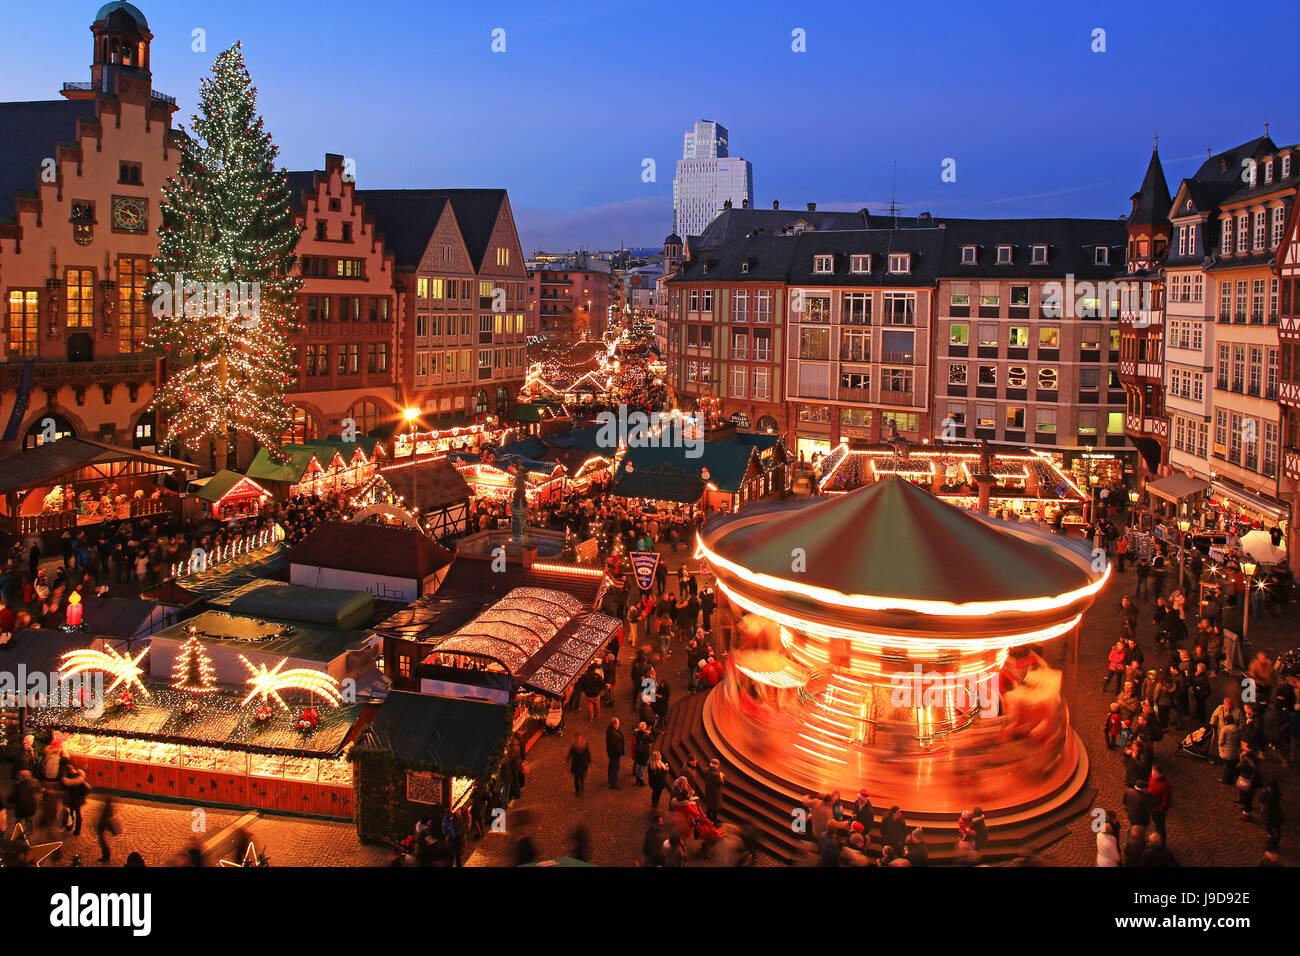 Foire de Noël sur la place Roemerberg, Frankfurt am Main, Hesse, Germany, Europe Photo Stock